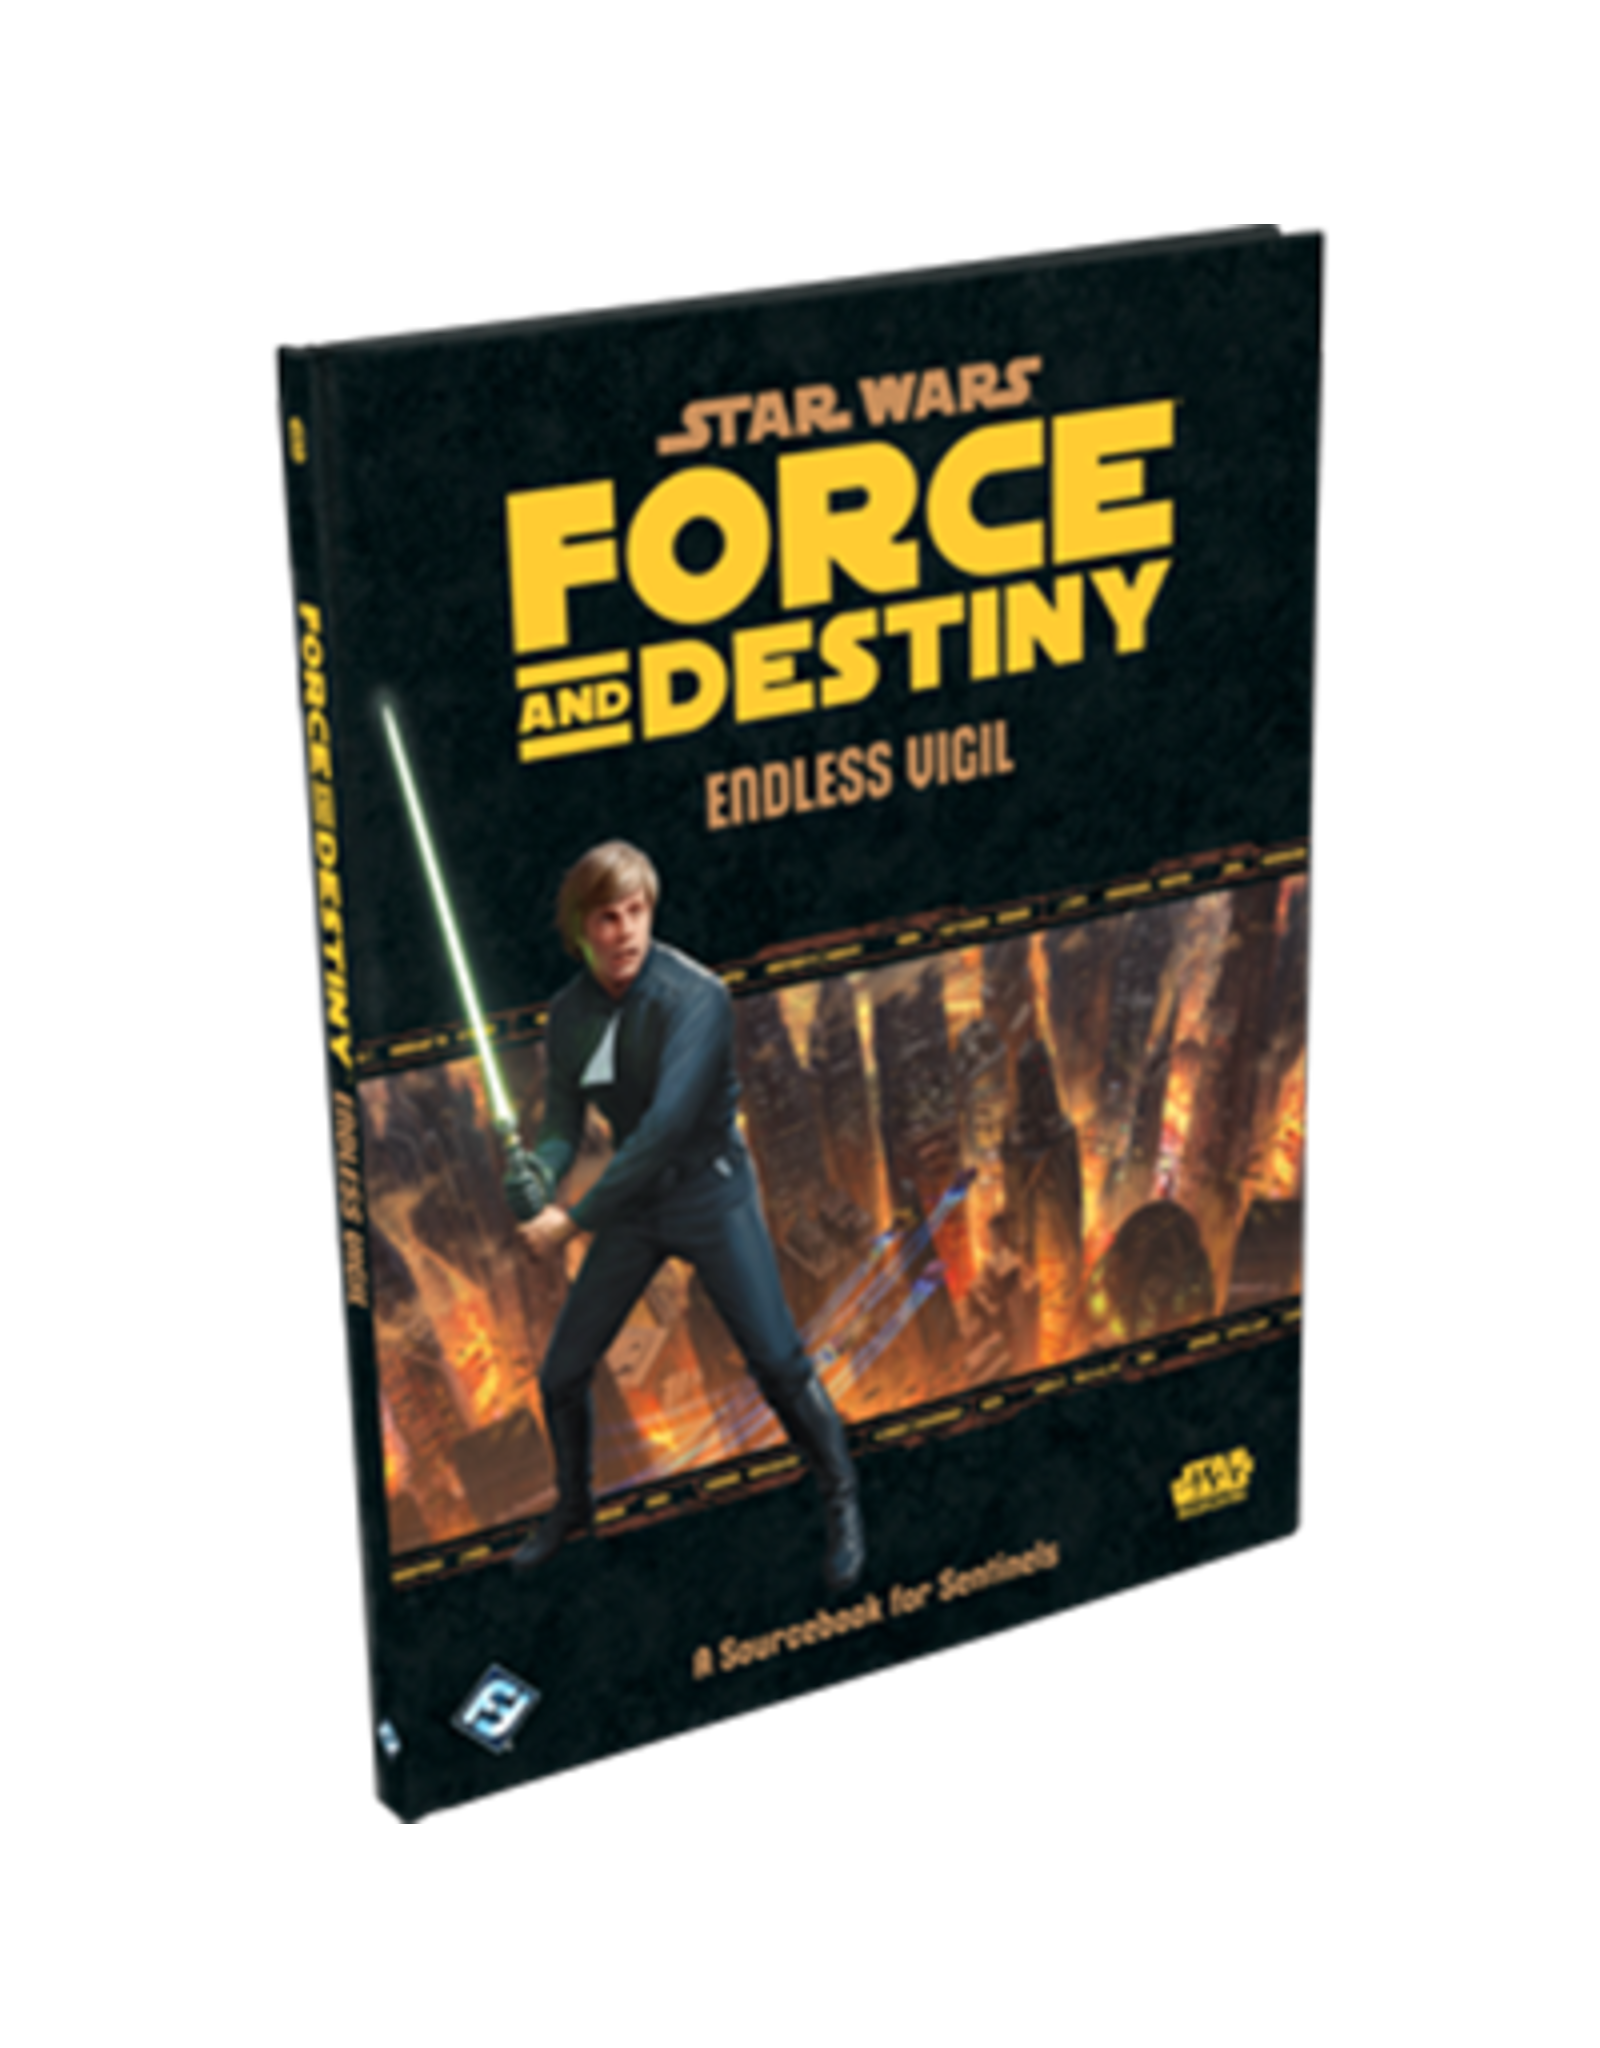 Fantasy Flight Games Star Wars Force and Destiny: Endless Vigil